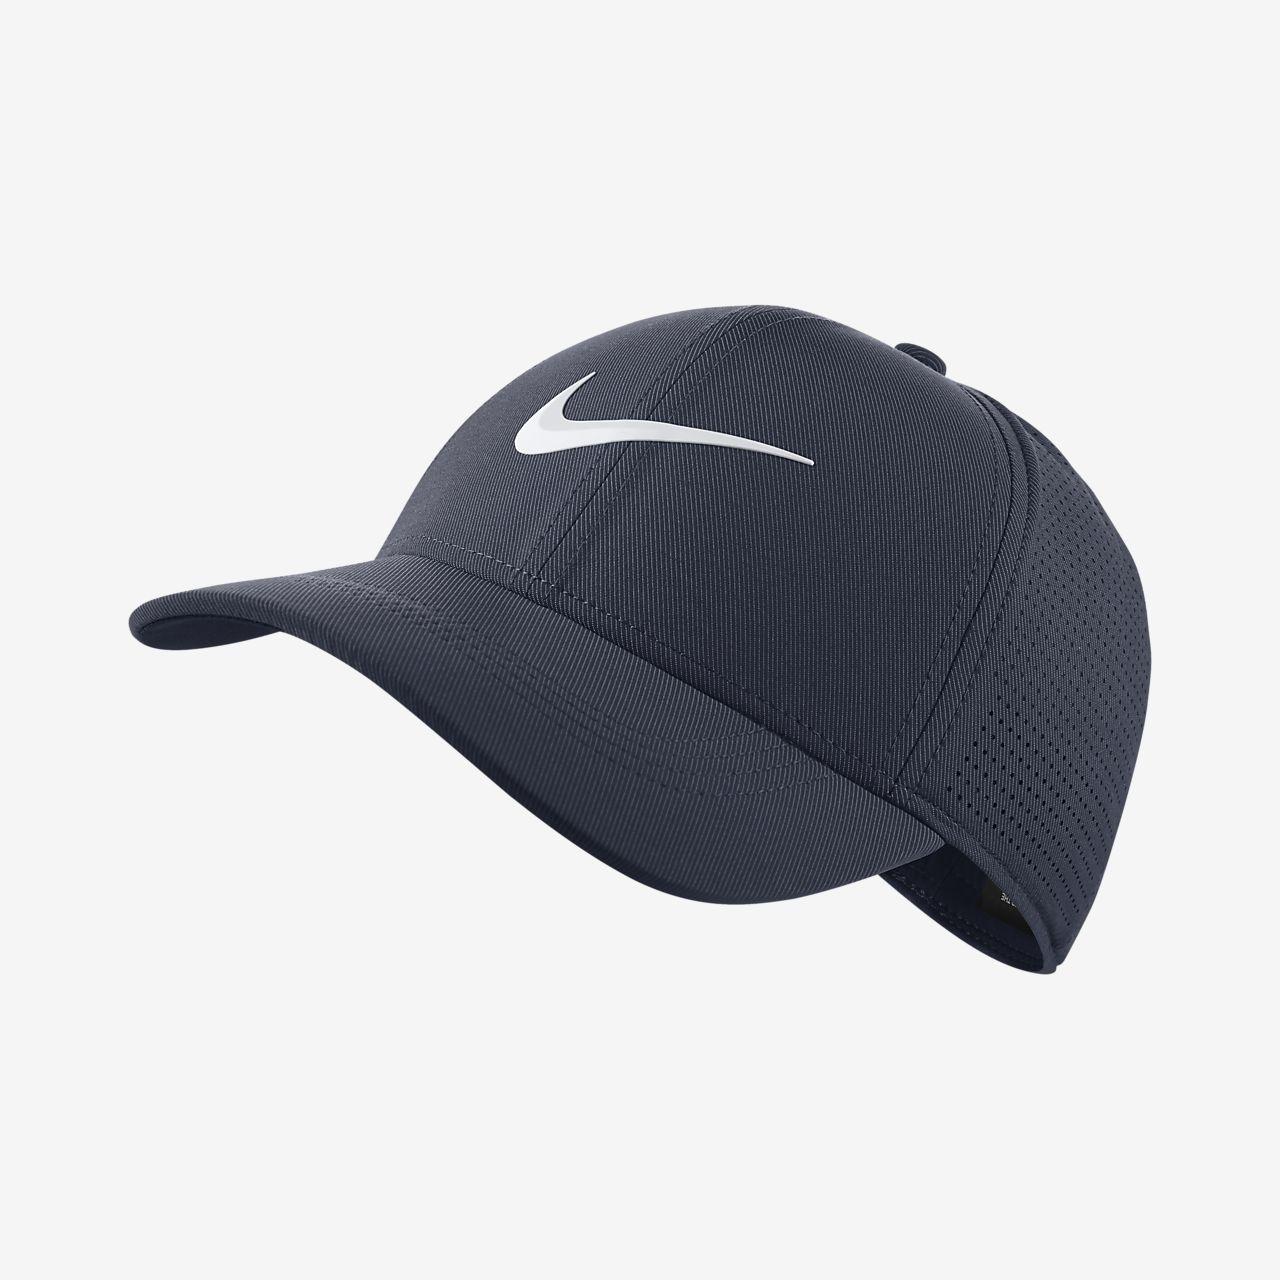 7ee6b874e31 Nike AeroBill Legacy 91 Fitted Golf Hat. Nike.com